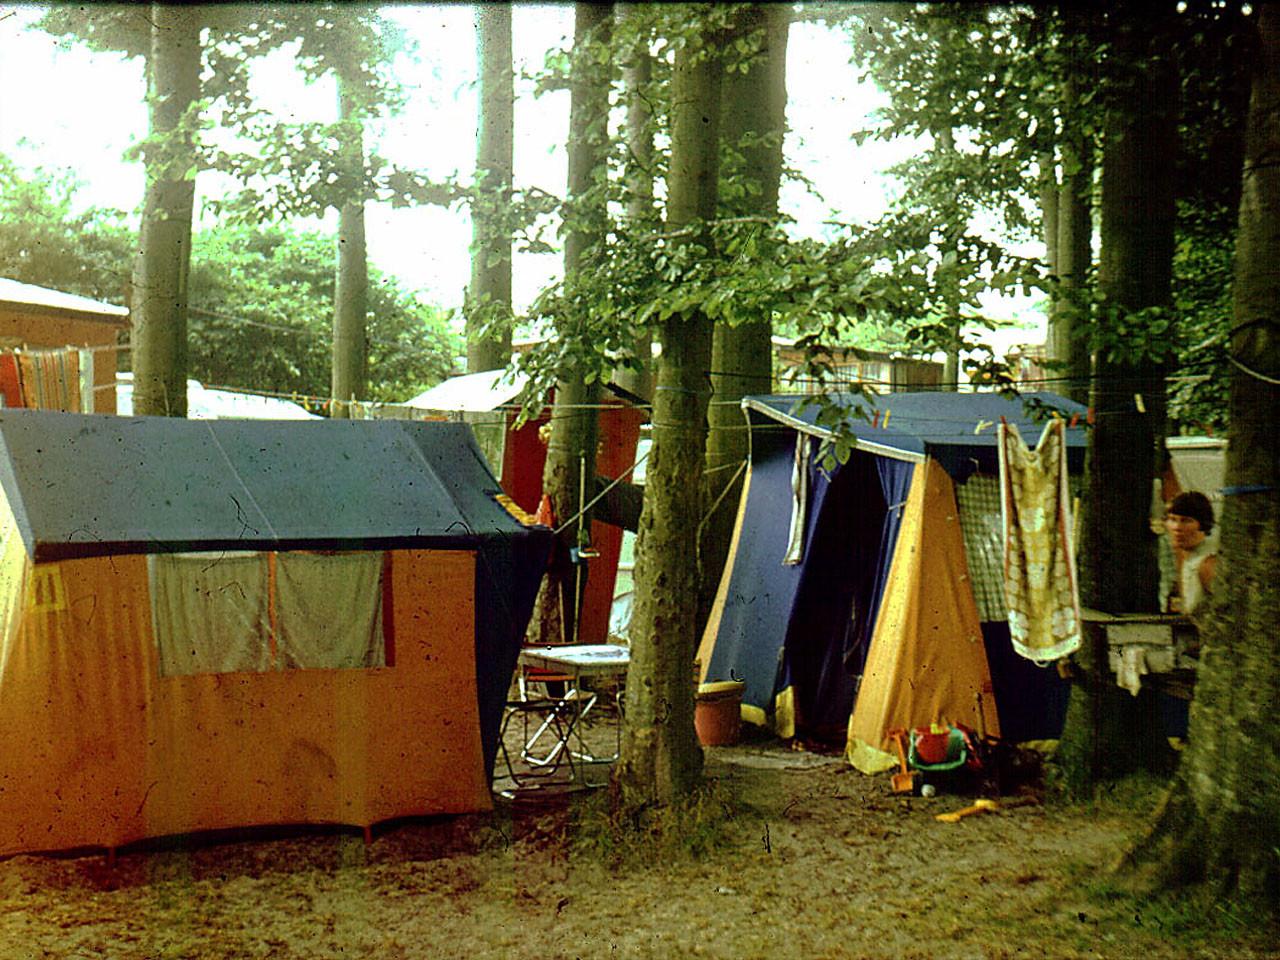 Urlaub auf dem Campingplatz Ückeritz (Usedom)